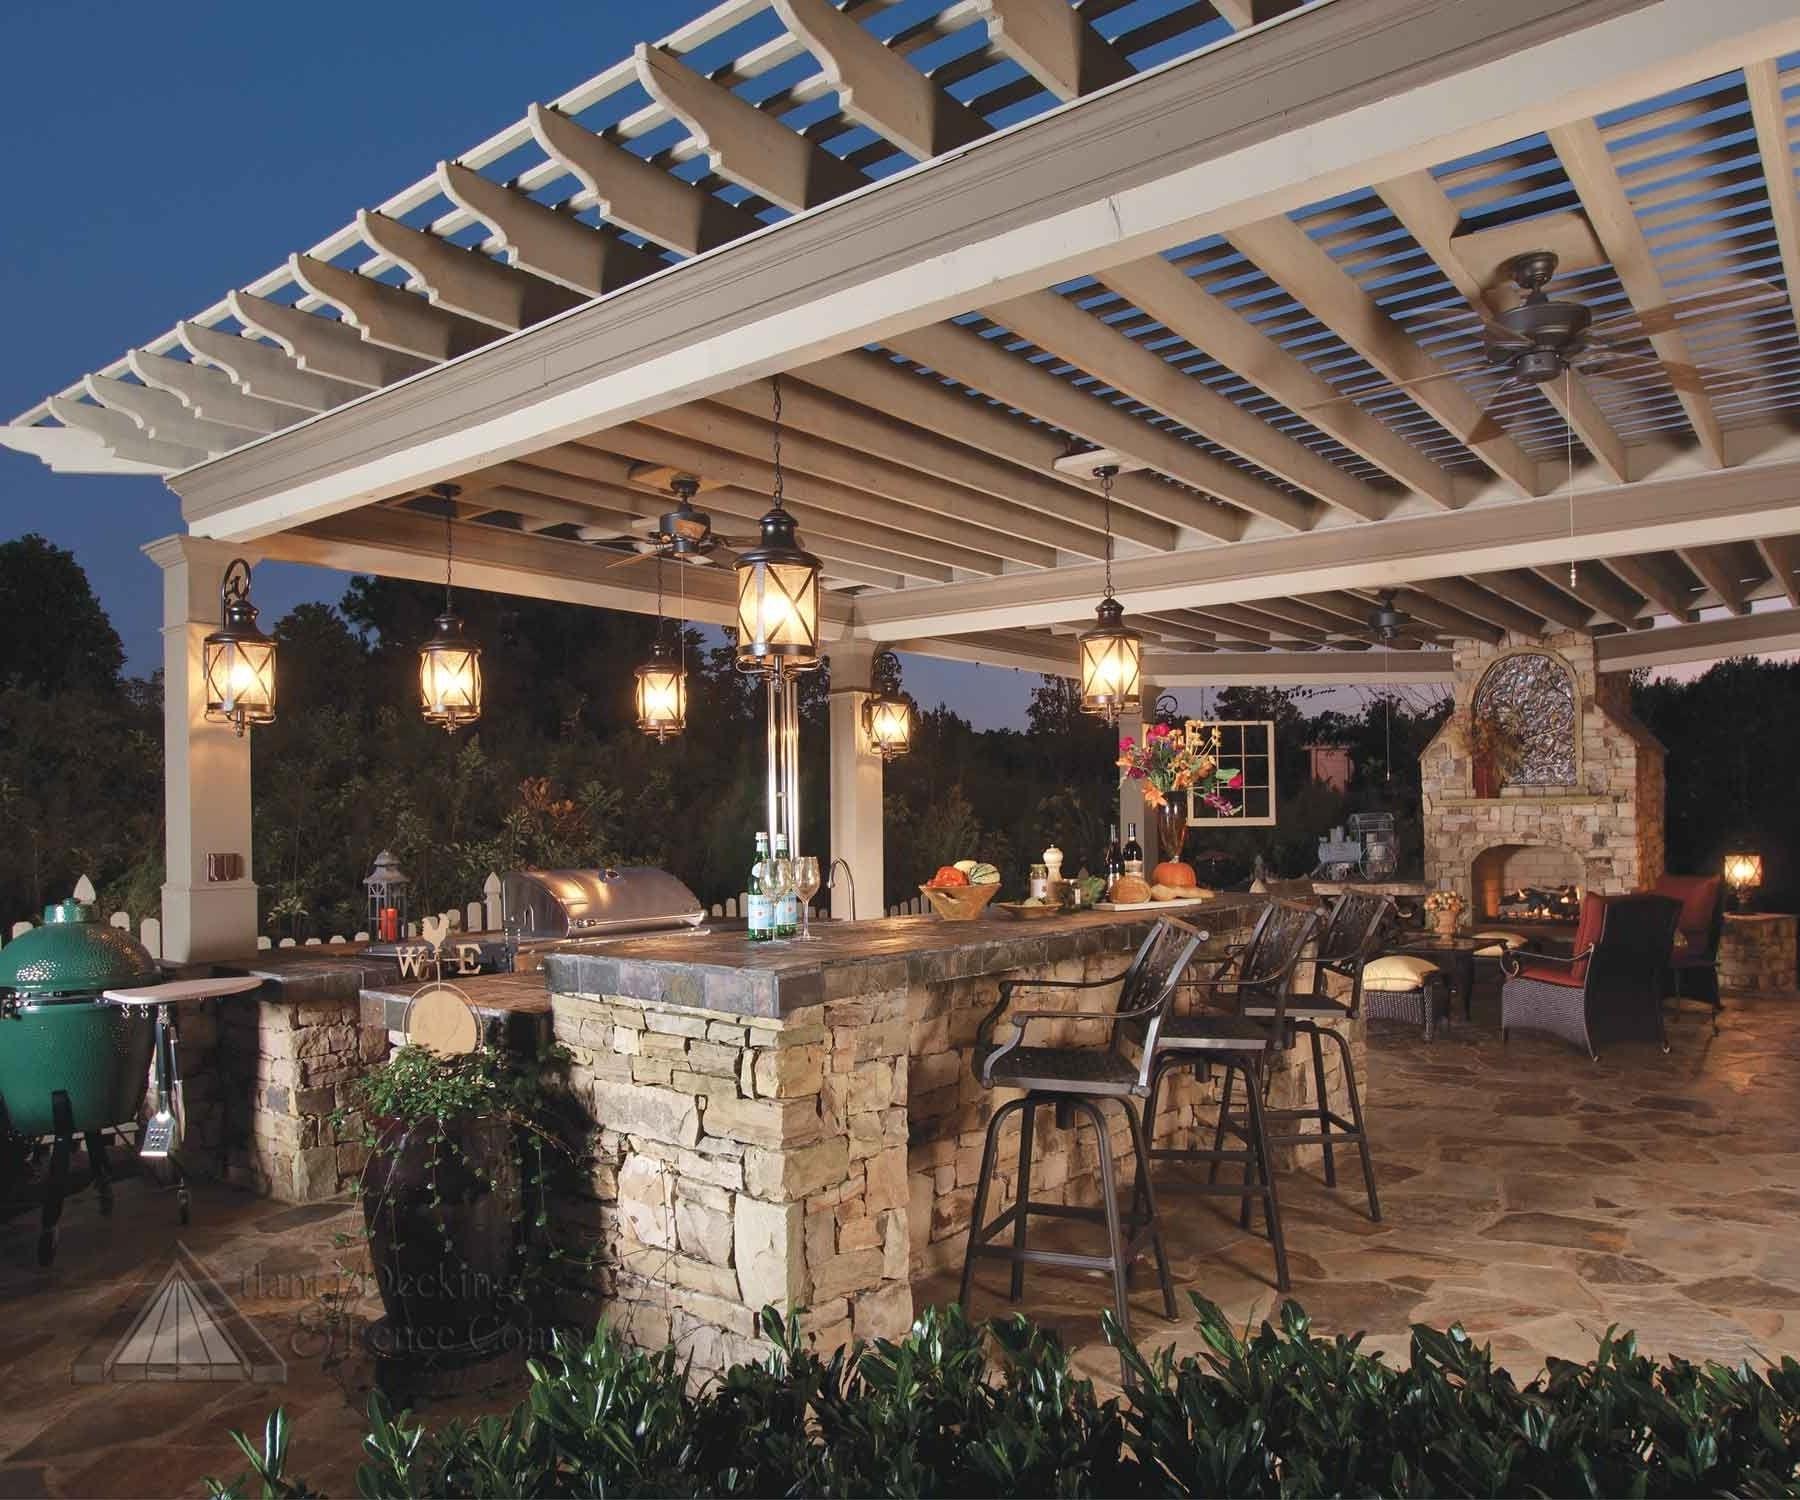 Diy Outdoor Hanging Lights – Outdoor Designs With Recent Diy Outdoor Ceiling Lights (View 17 of 20)